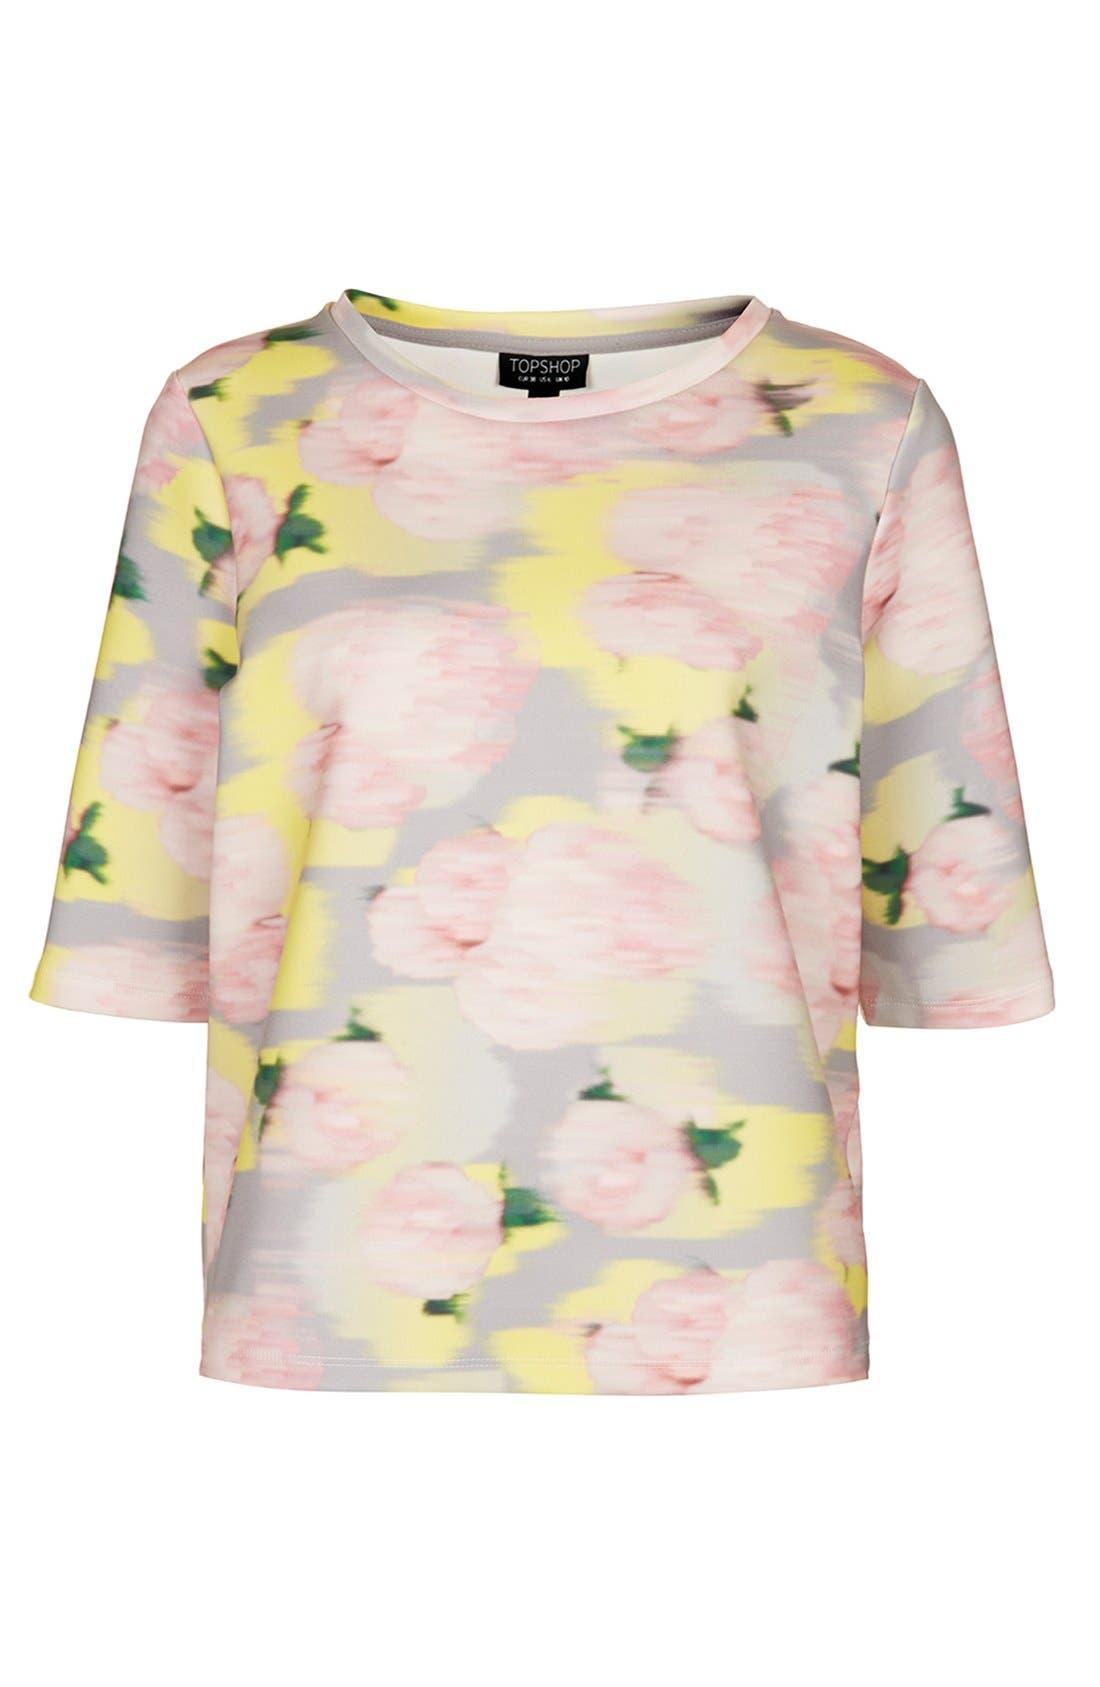 Alternate Image 3  - Topshop 'Blurred Floral' Print Scuba Top